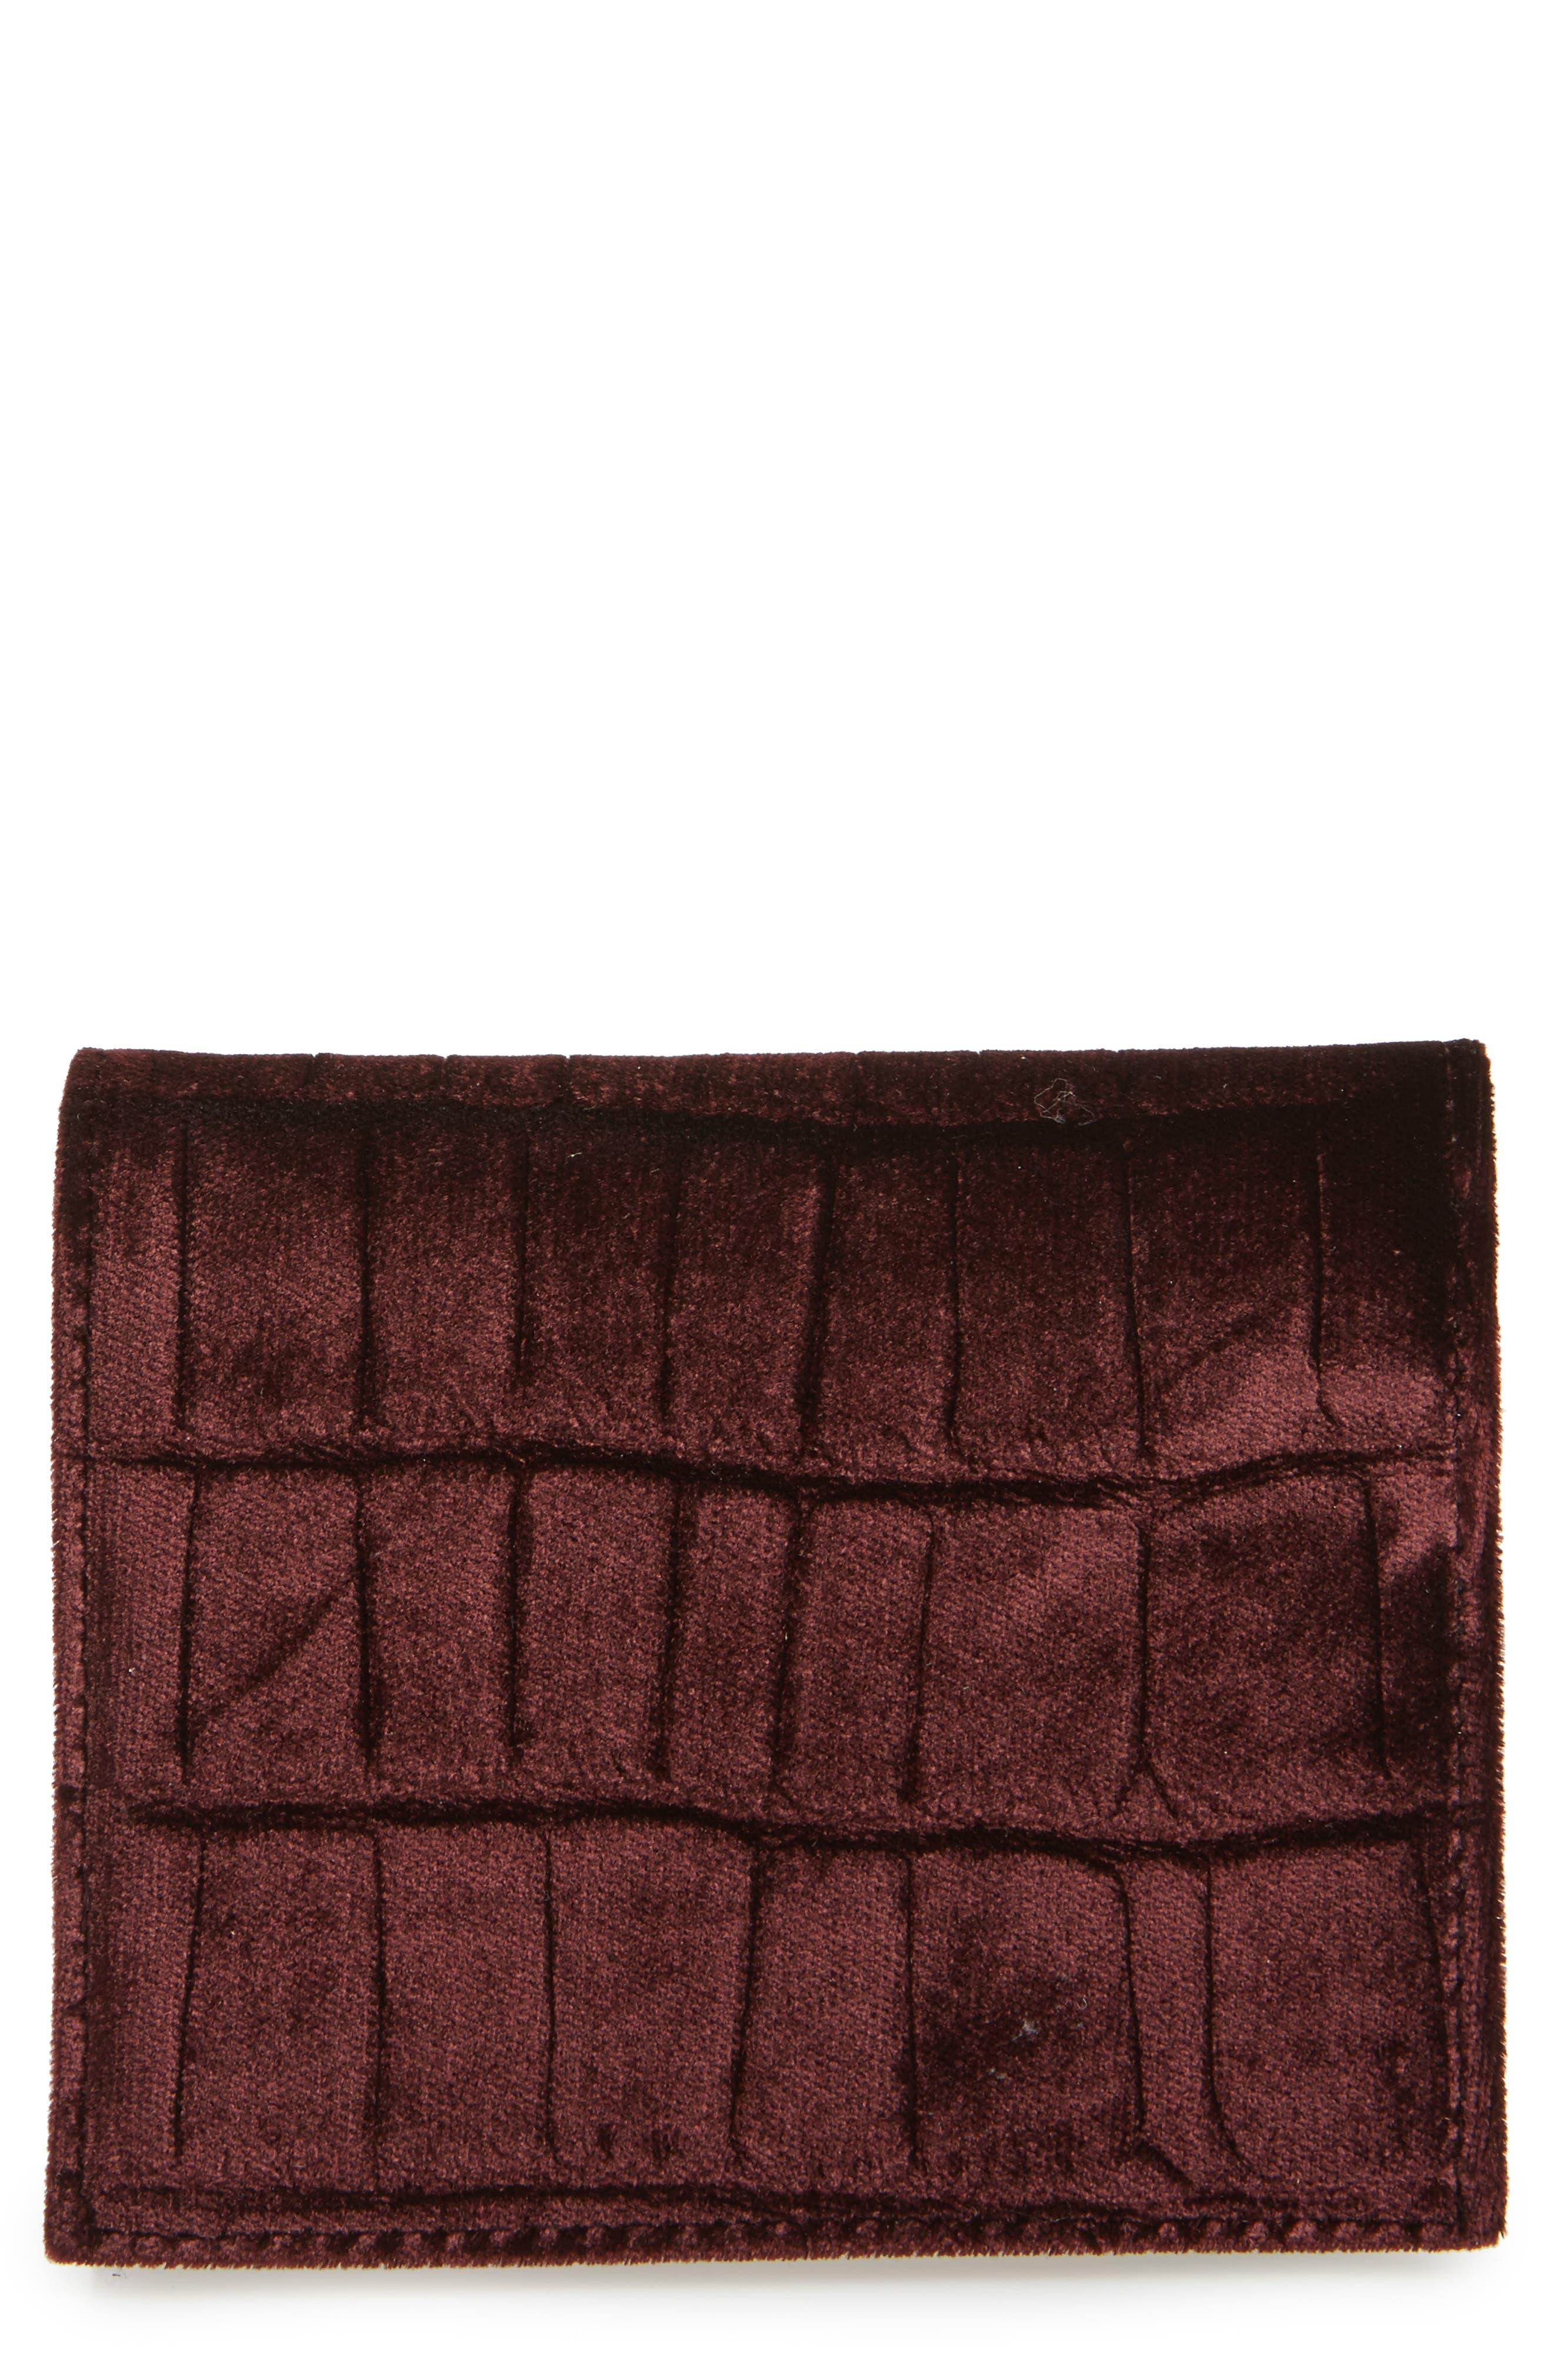 Small Keel Croc Embossed Velvet Wallet,                         Main,                         color, Burgundy Red